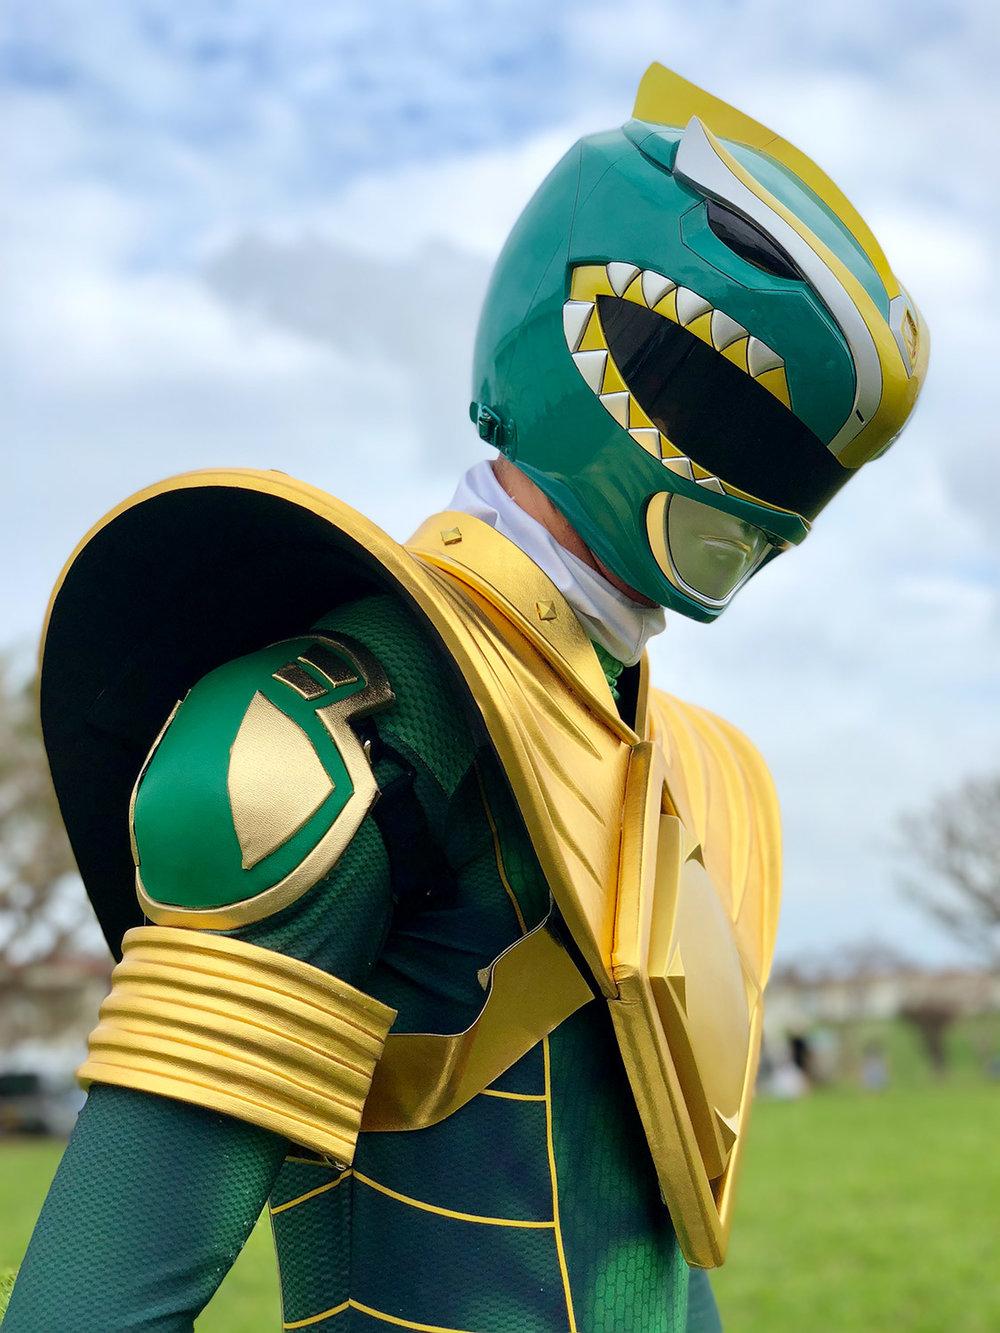 Power Ranger #ShotOniPhone #ShotOniPhoneX using portrait mode.